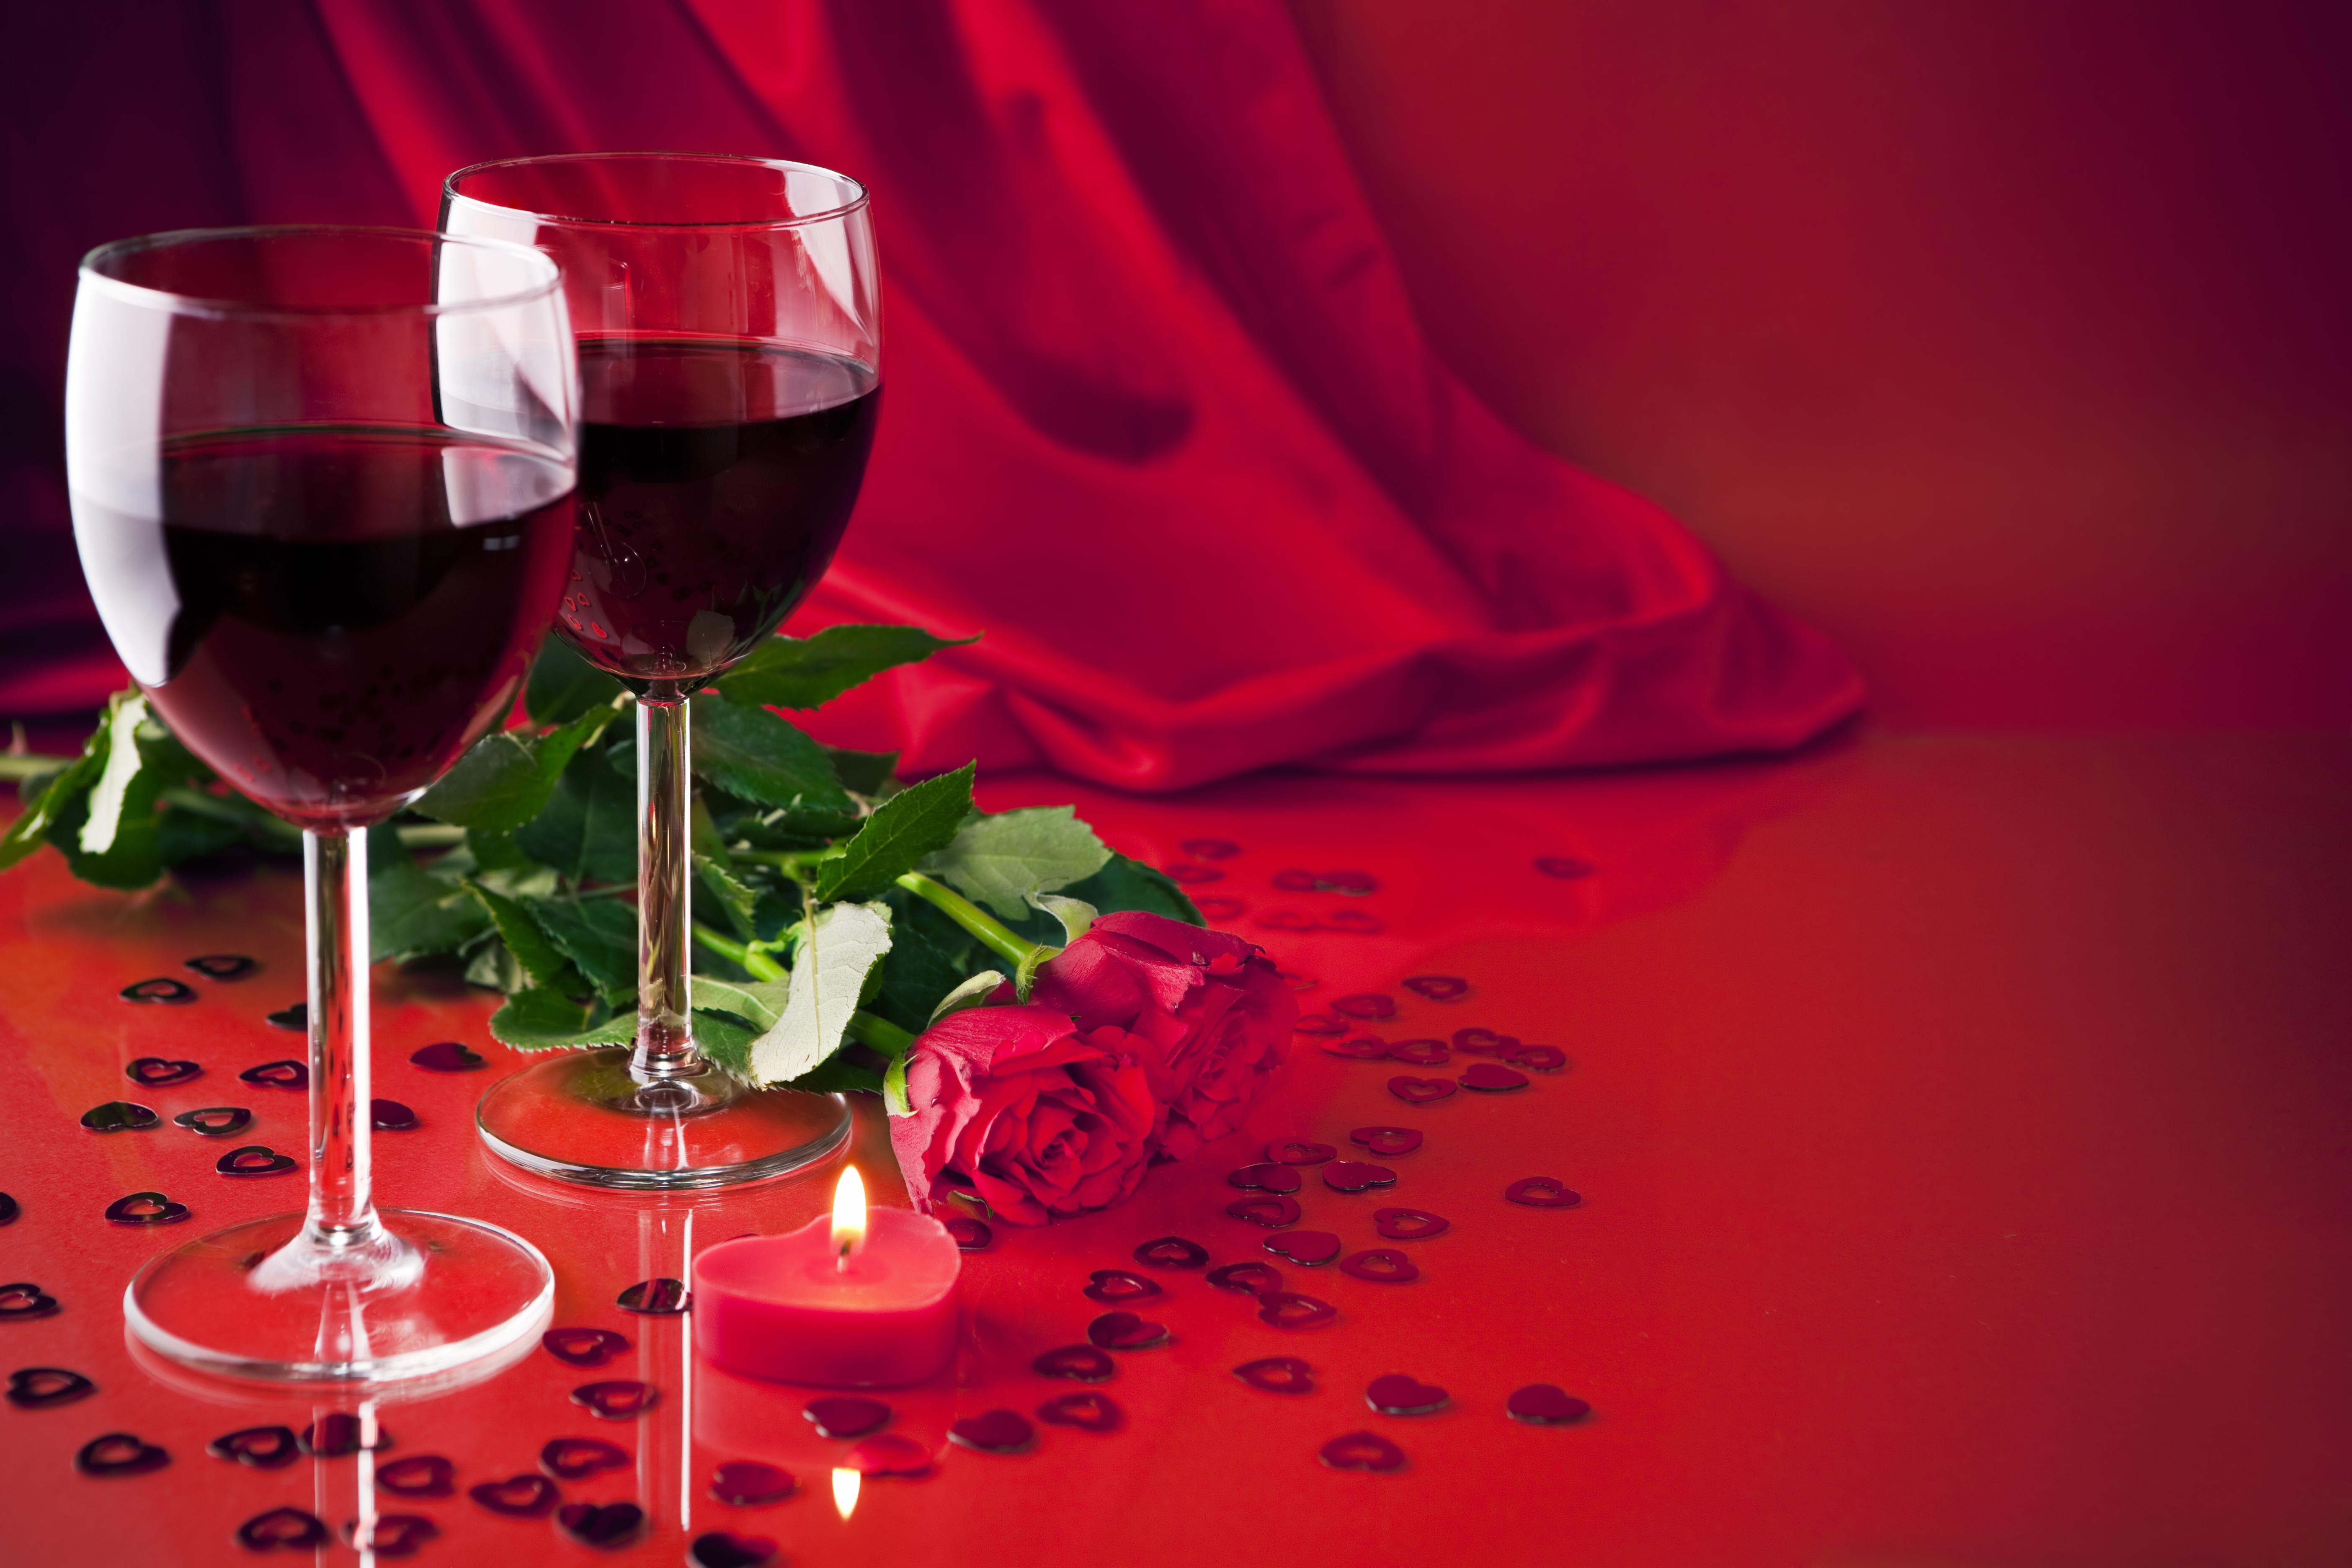 бокал вино корзина сирень  № 3966530 бесплатно